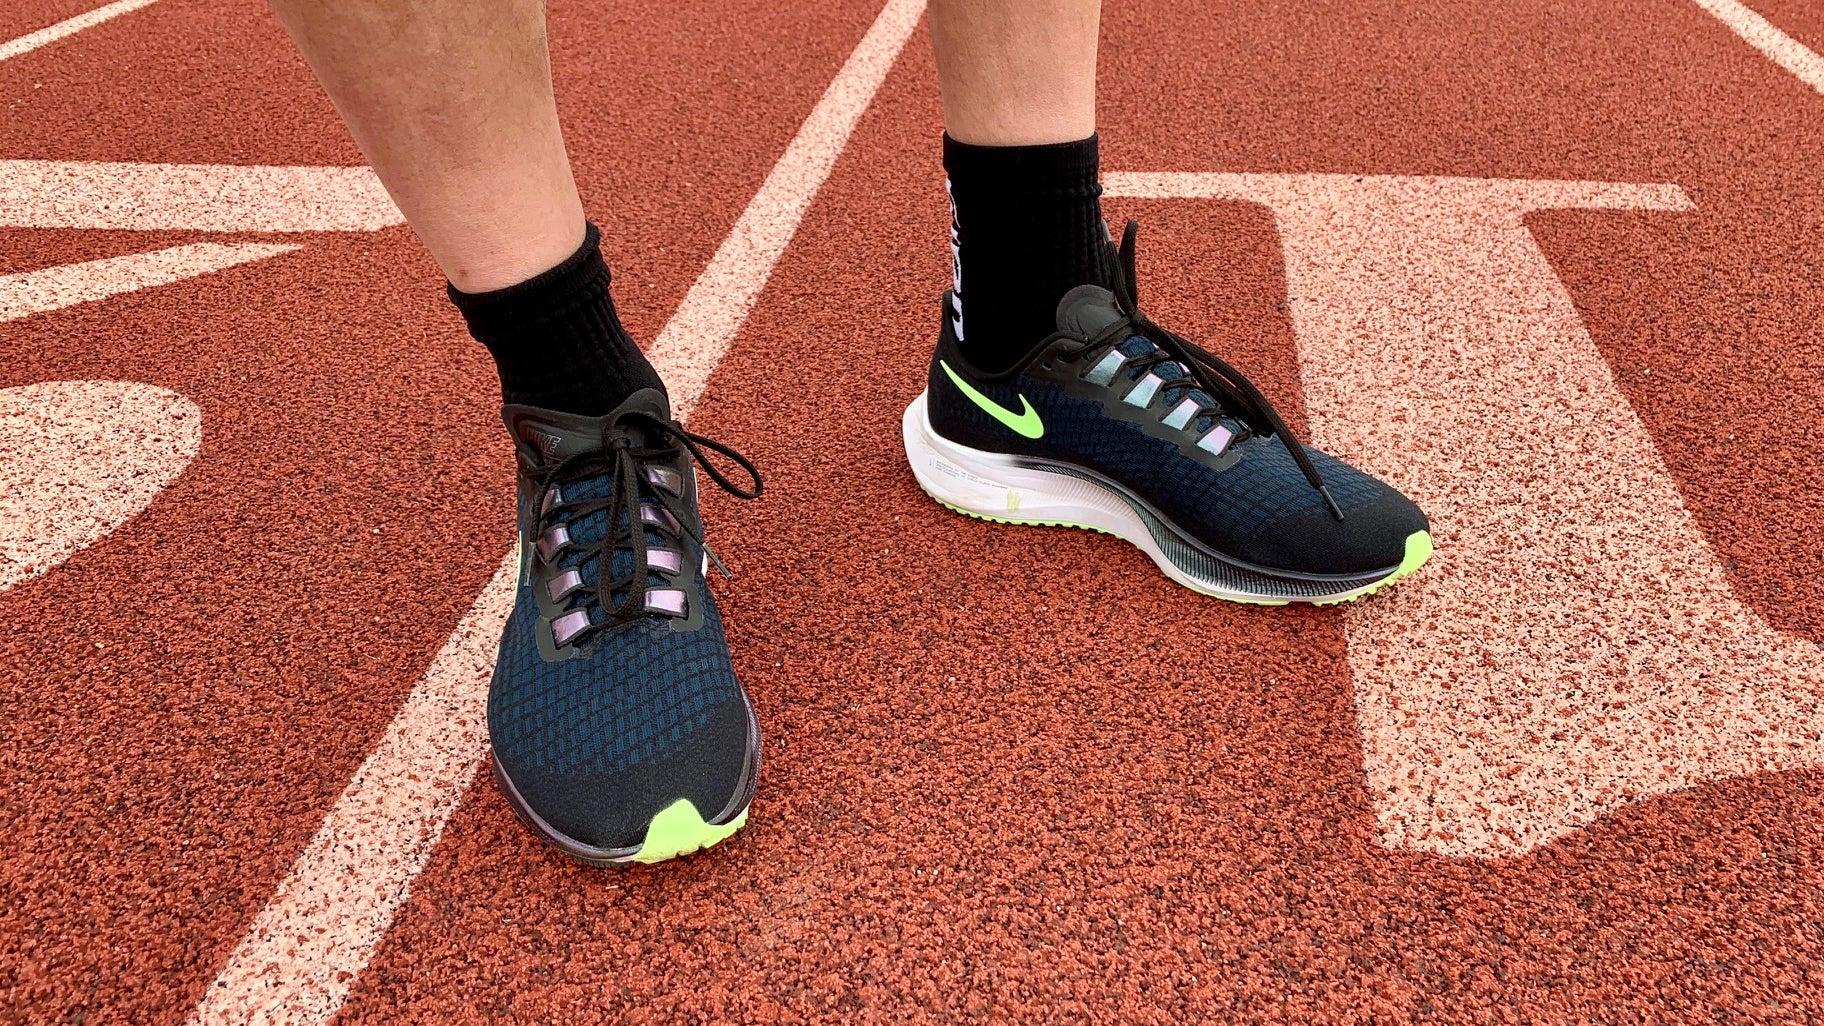 Nike Pegasus 37 reviewed